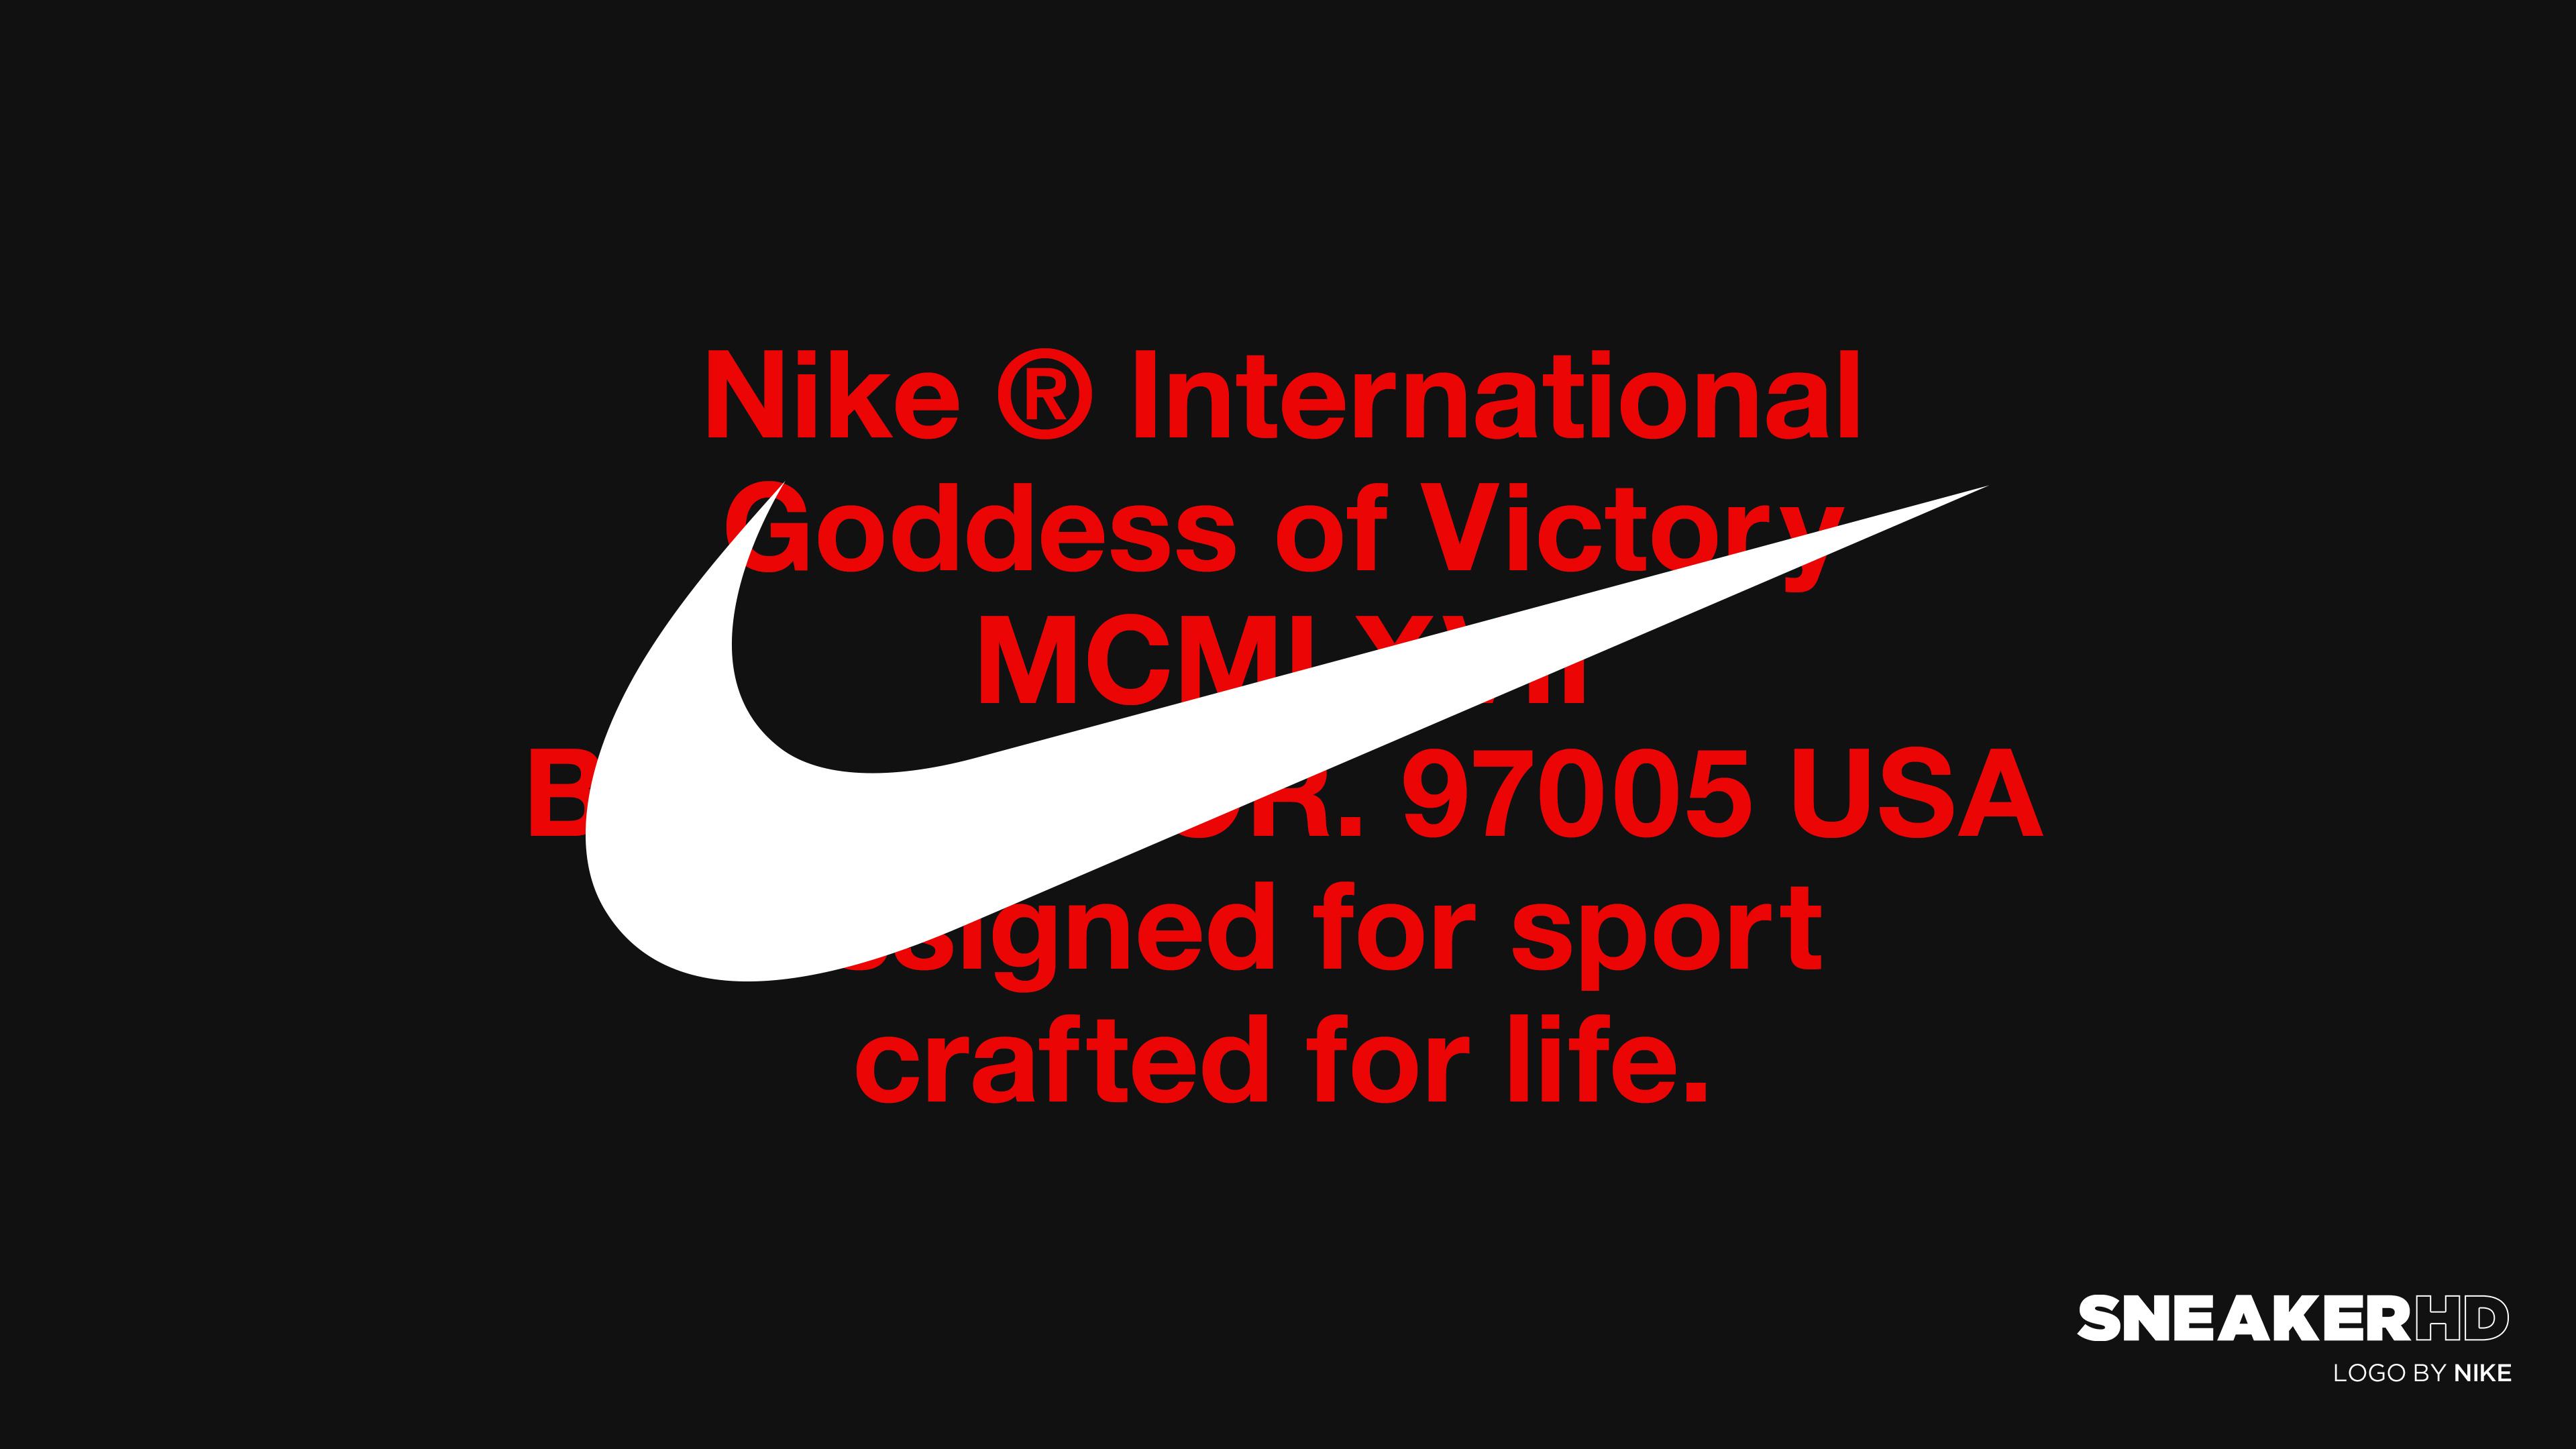 SneakerHDWallpaperscom Your favorite sneakers in 4K Retina 3840x2160